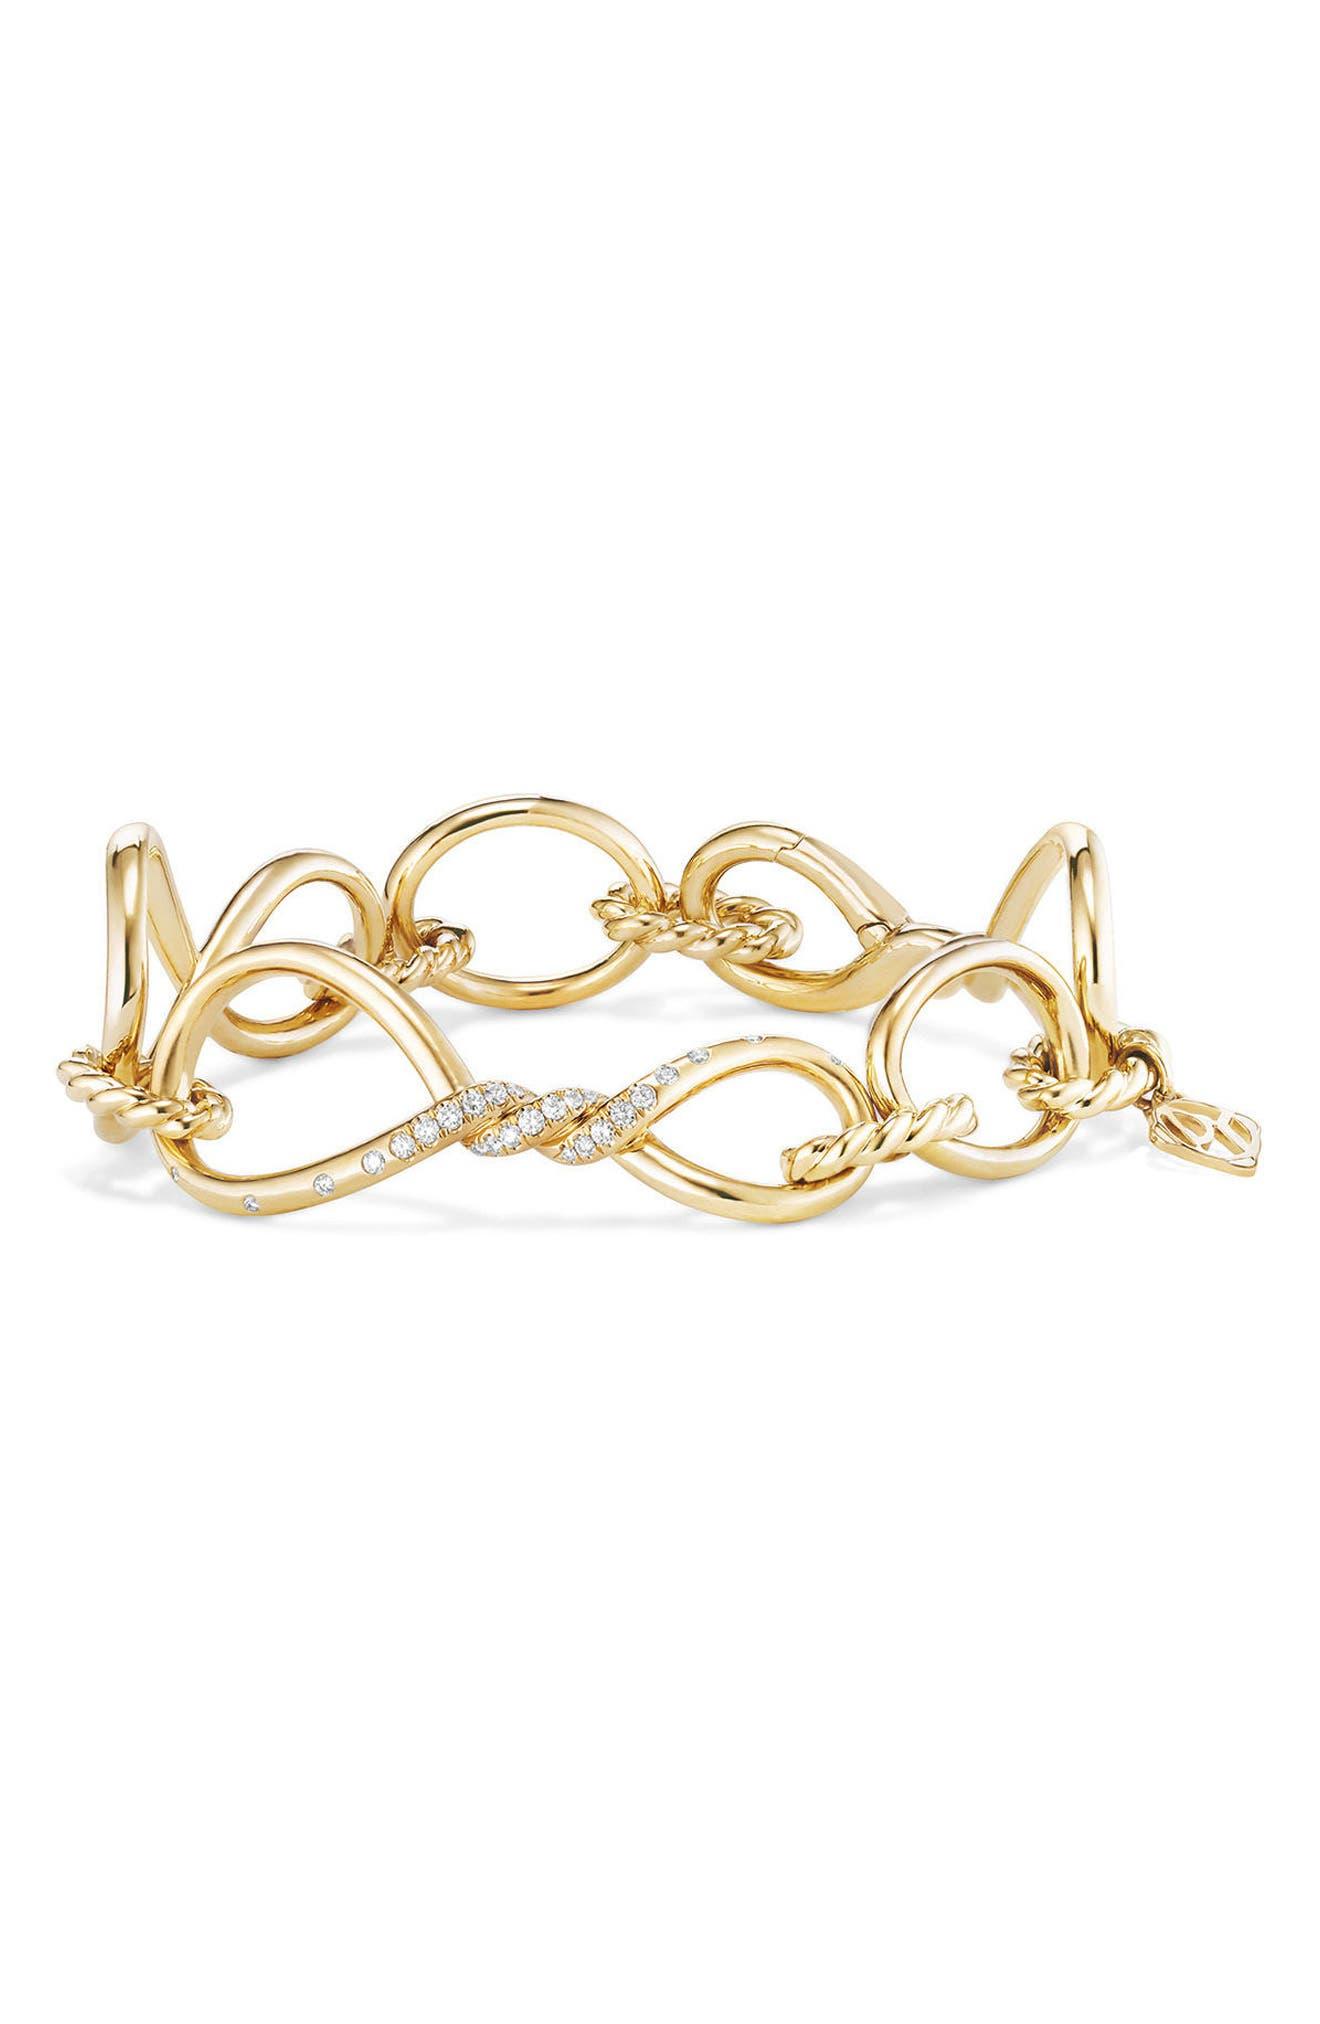 David Yurman Continuance Chain Bracelet with Diamonds